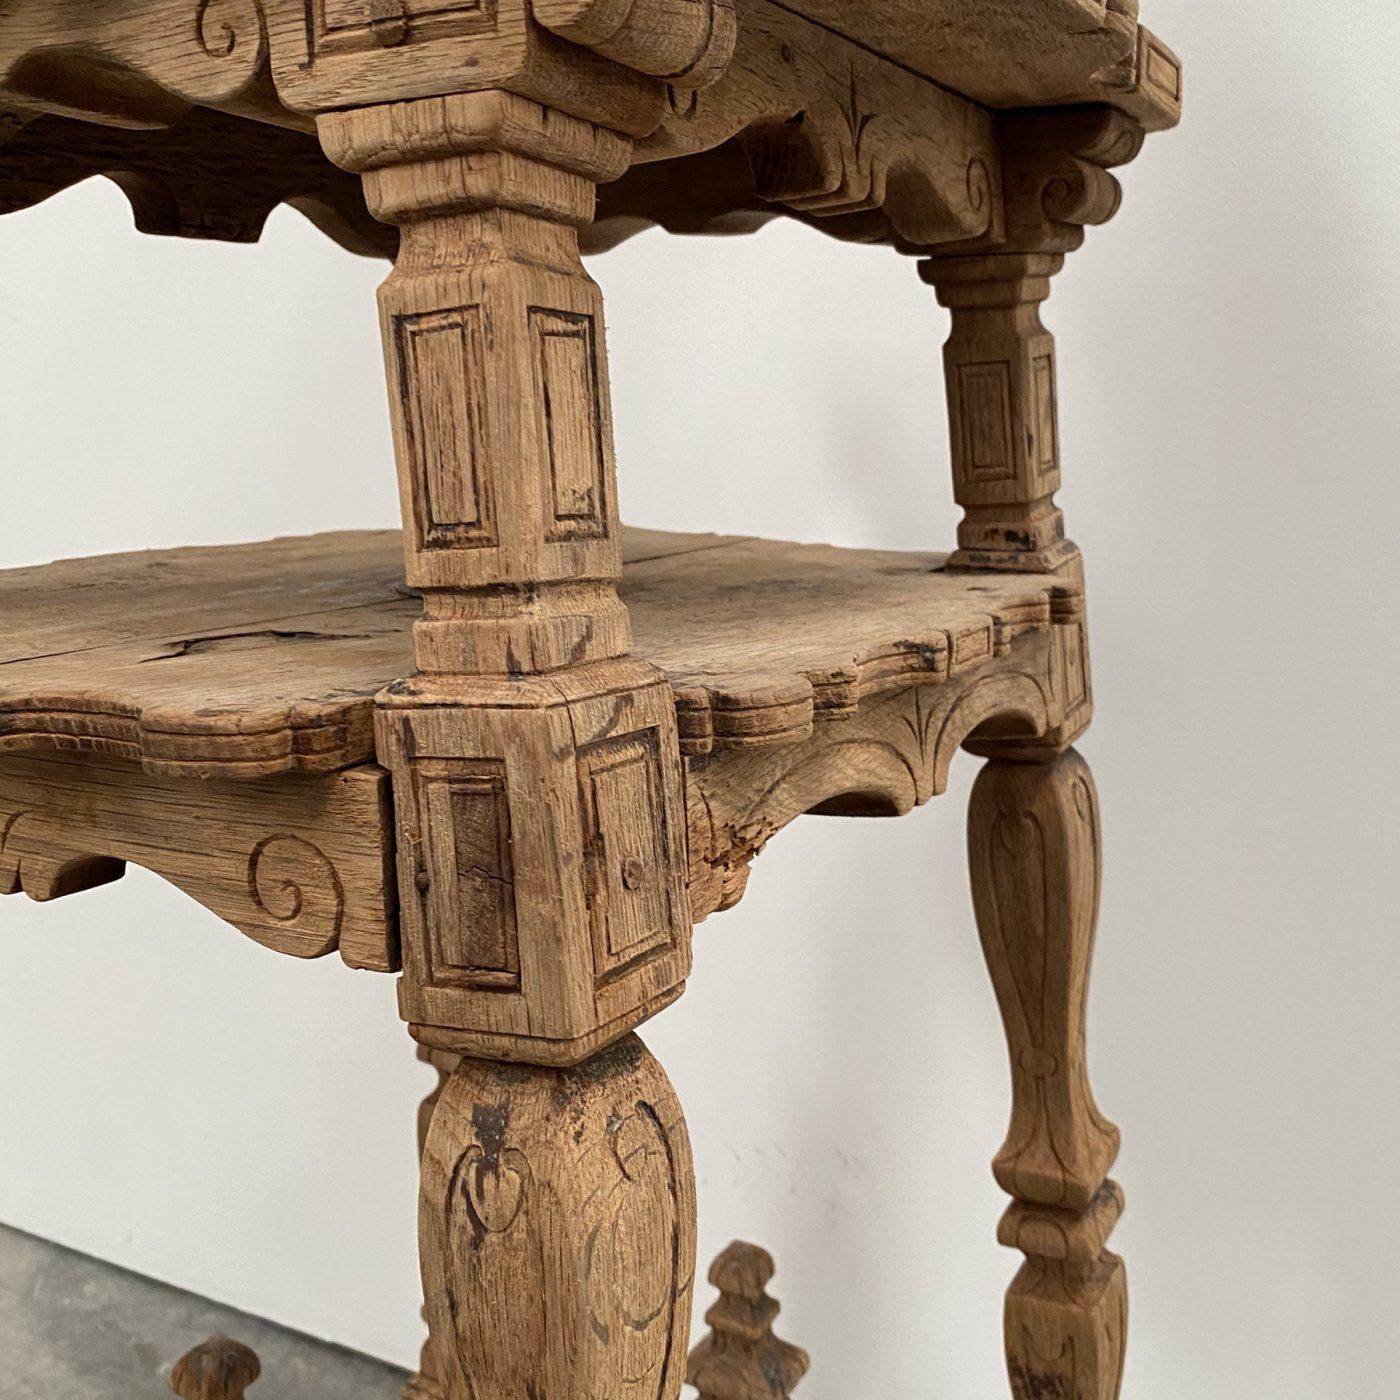 objet-vagabond-sculptor-table0004